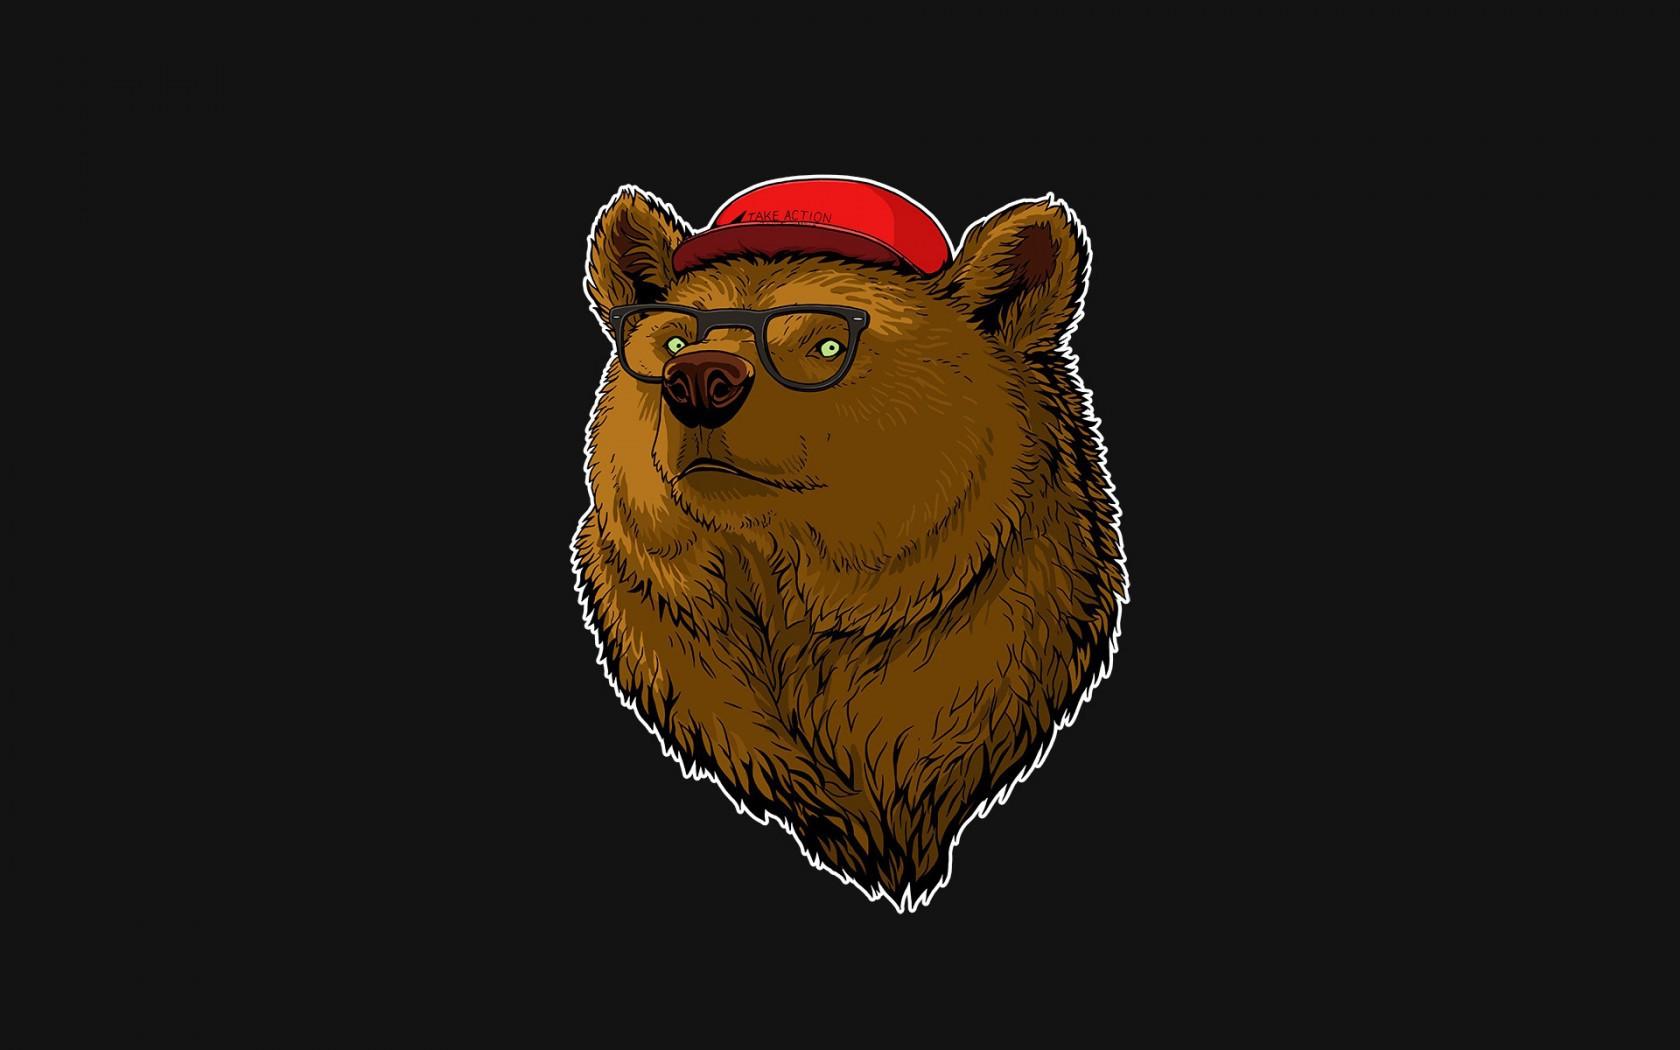 Картинки семьи, крутые картинки медведя